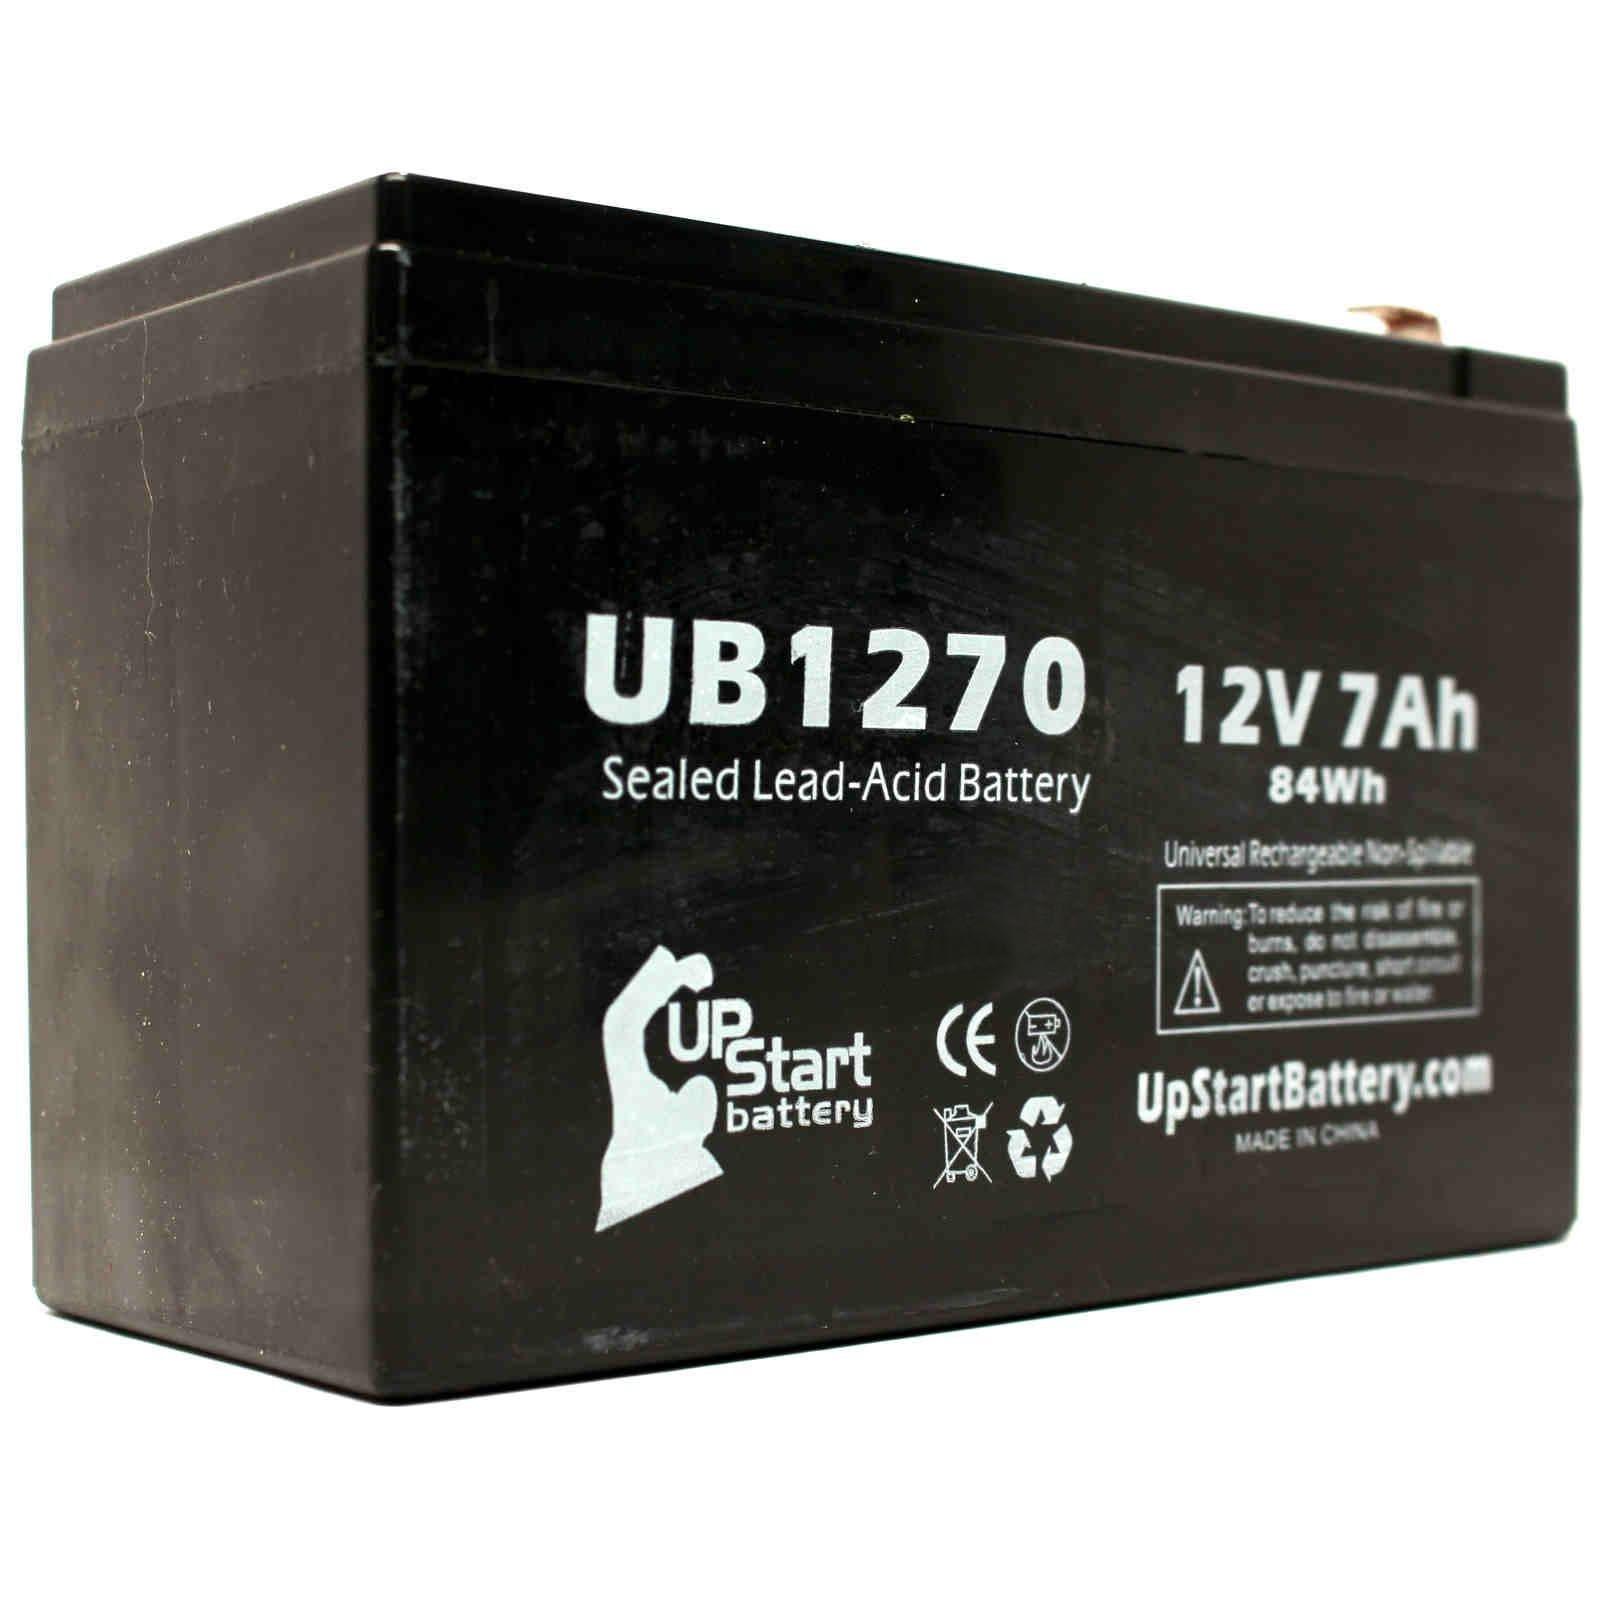 4x Pack - APC SMART-UPS 1500VA USB & SER SUA1500RMUS Battery - Replacement UB1270 Universal Sealed Lead Acid Battery (12V, 7Ah, 7000mAh, F1 Terminal, AGM, SLA) - Includes 8 F1 to F2 Terminal Adapters by UpStart Battery (Image #4)